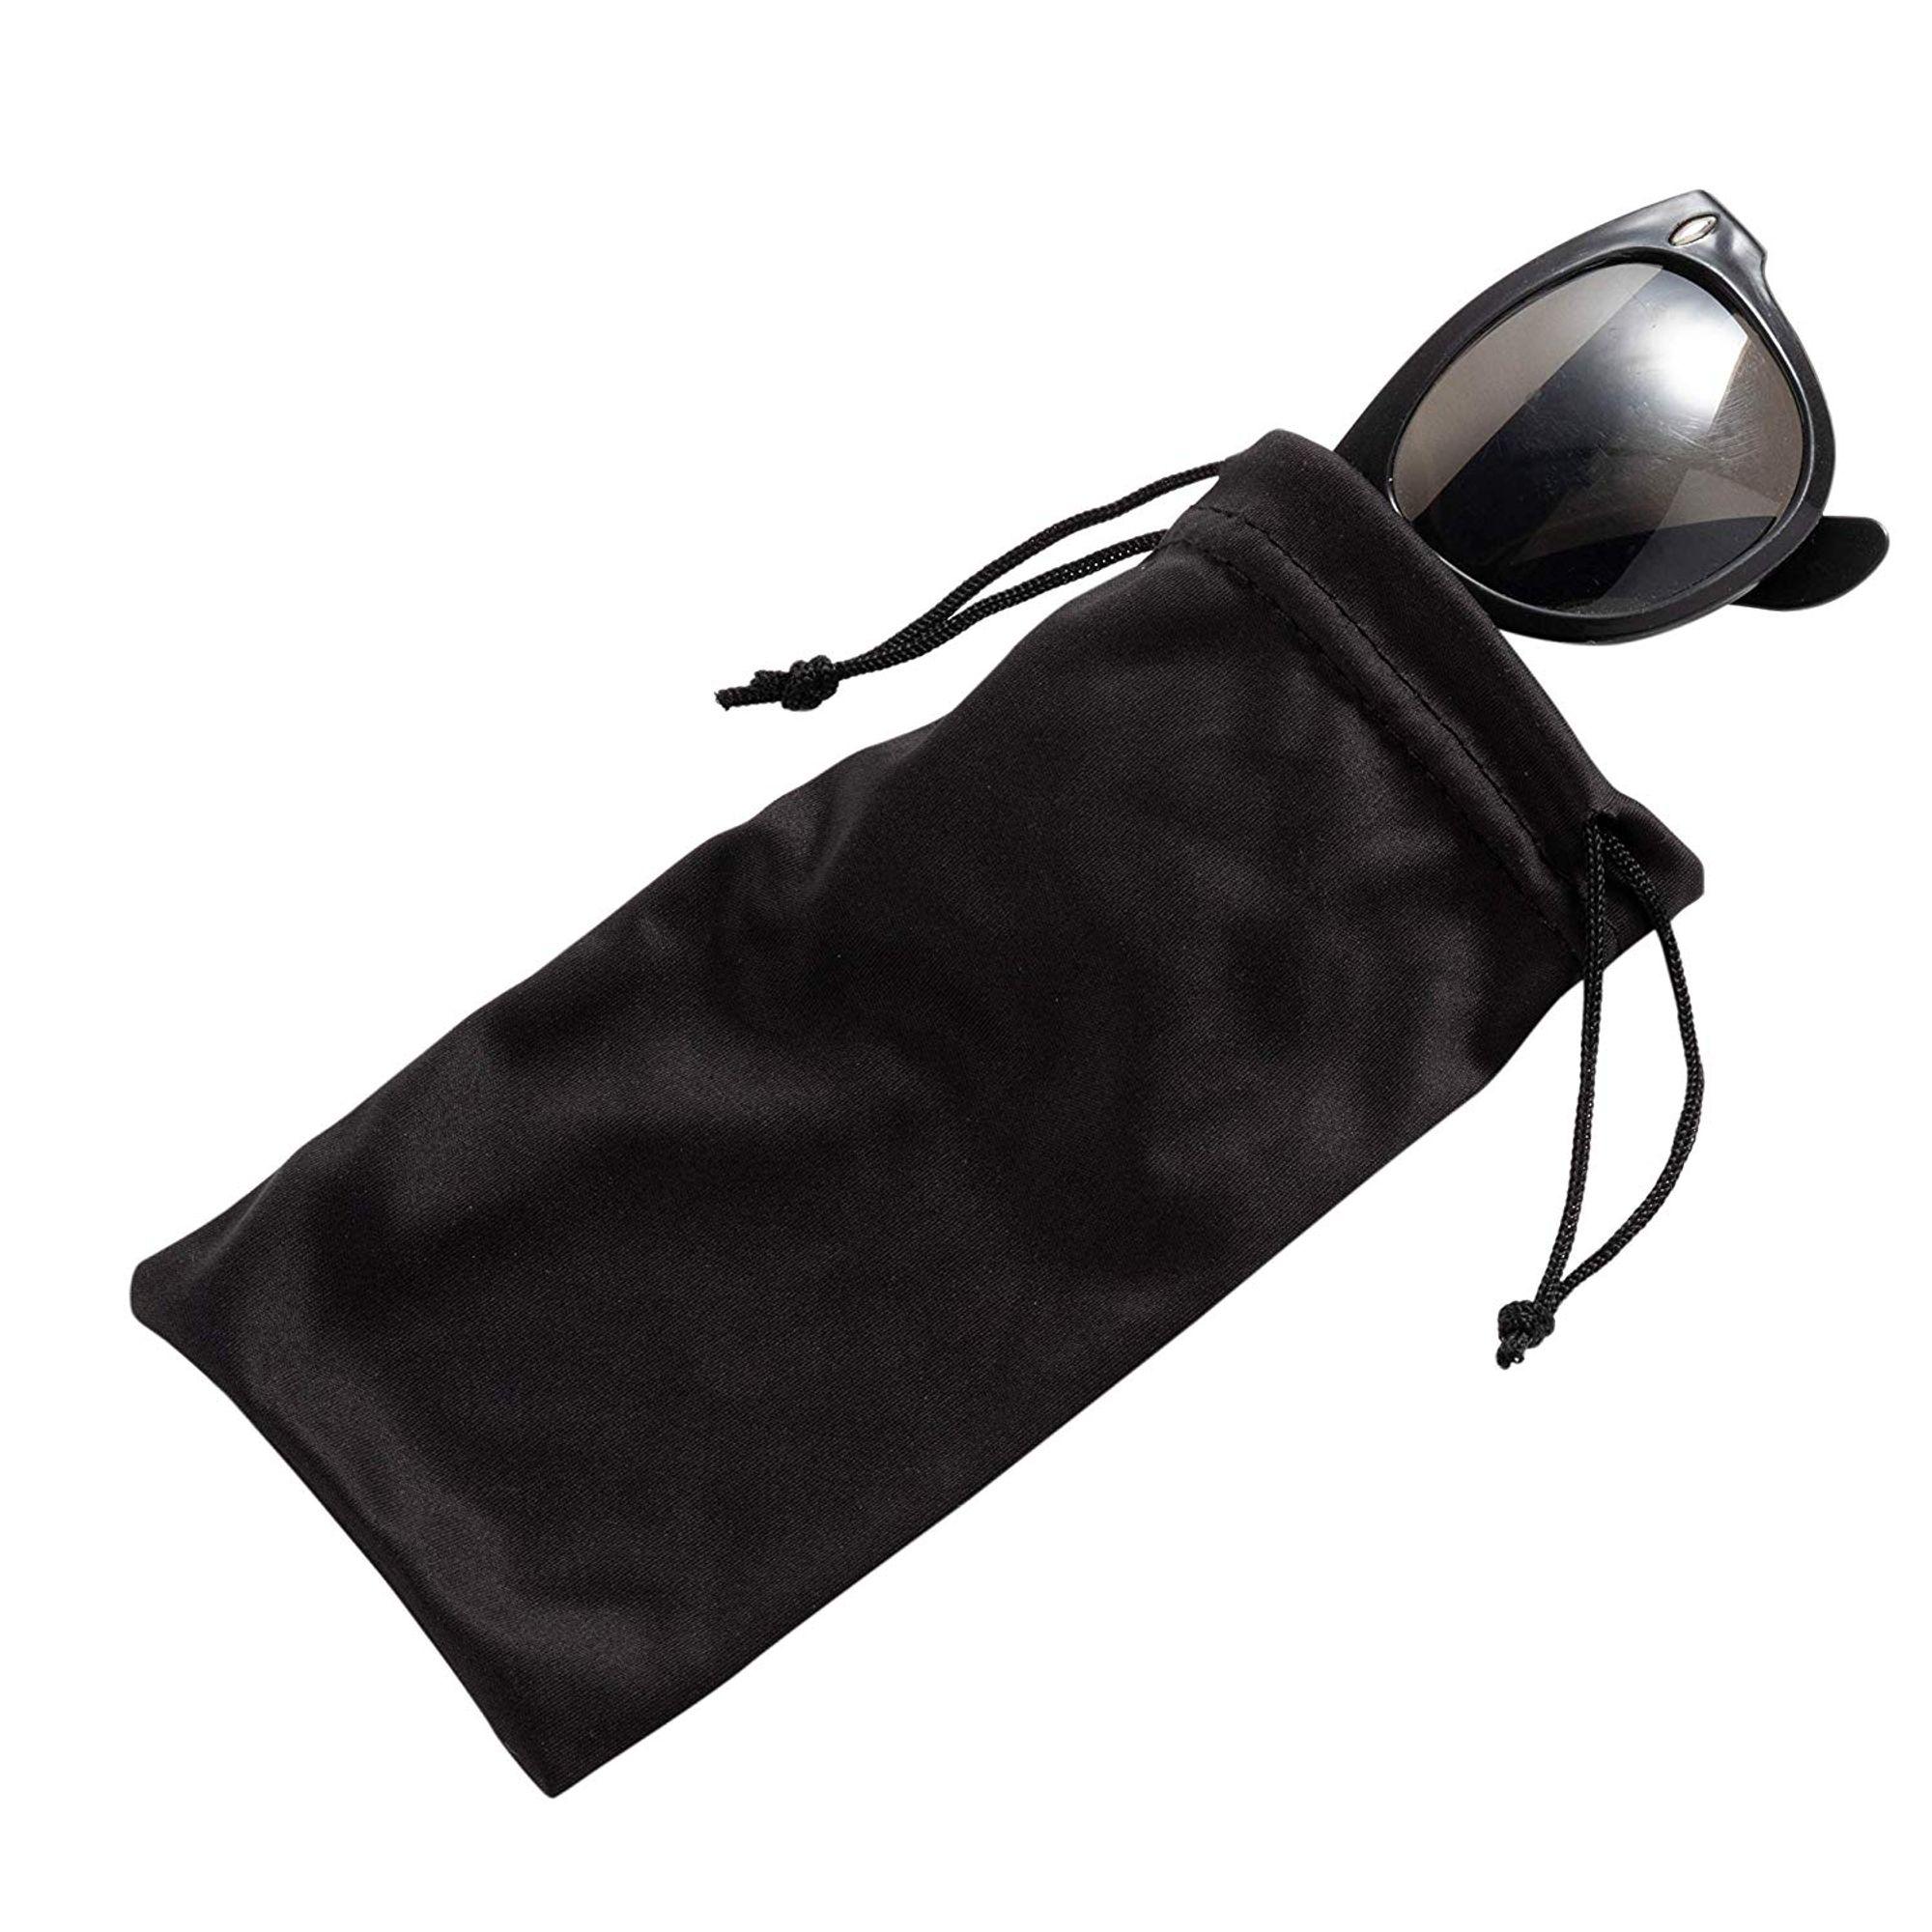 SOME Microfiber Drawstring Sunglasses Pouch